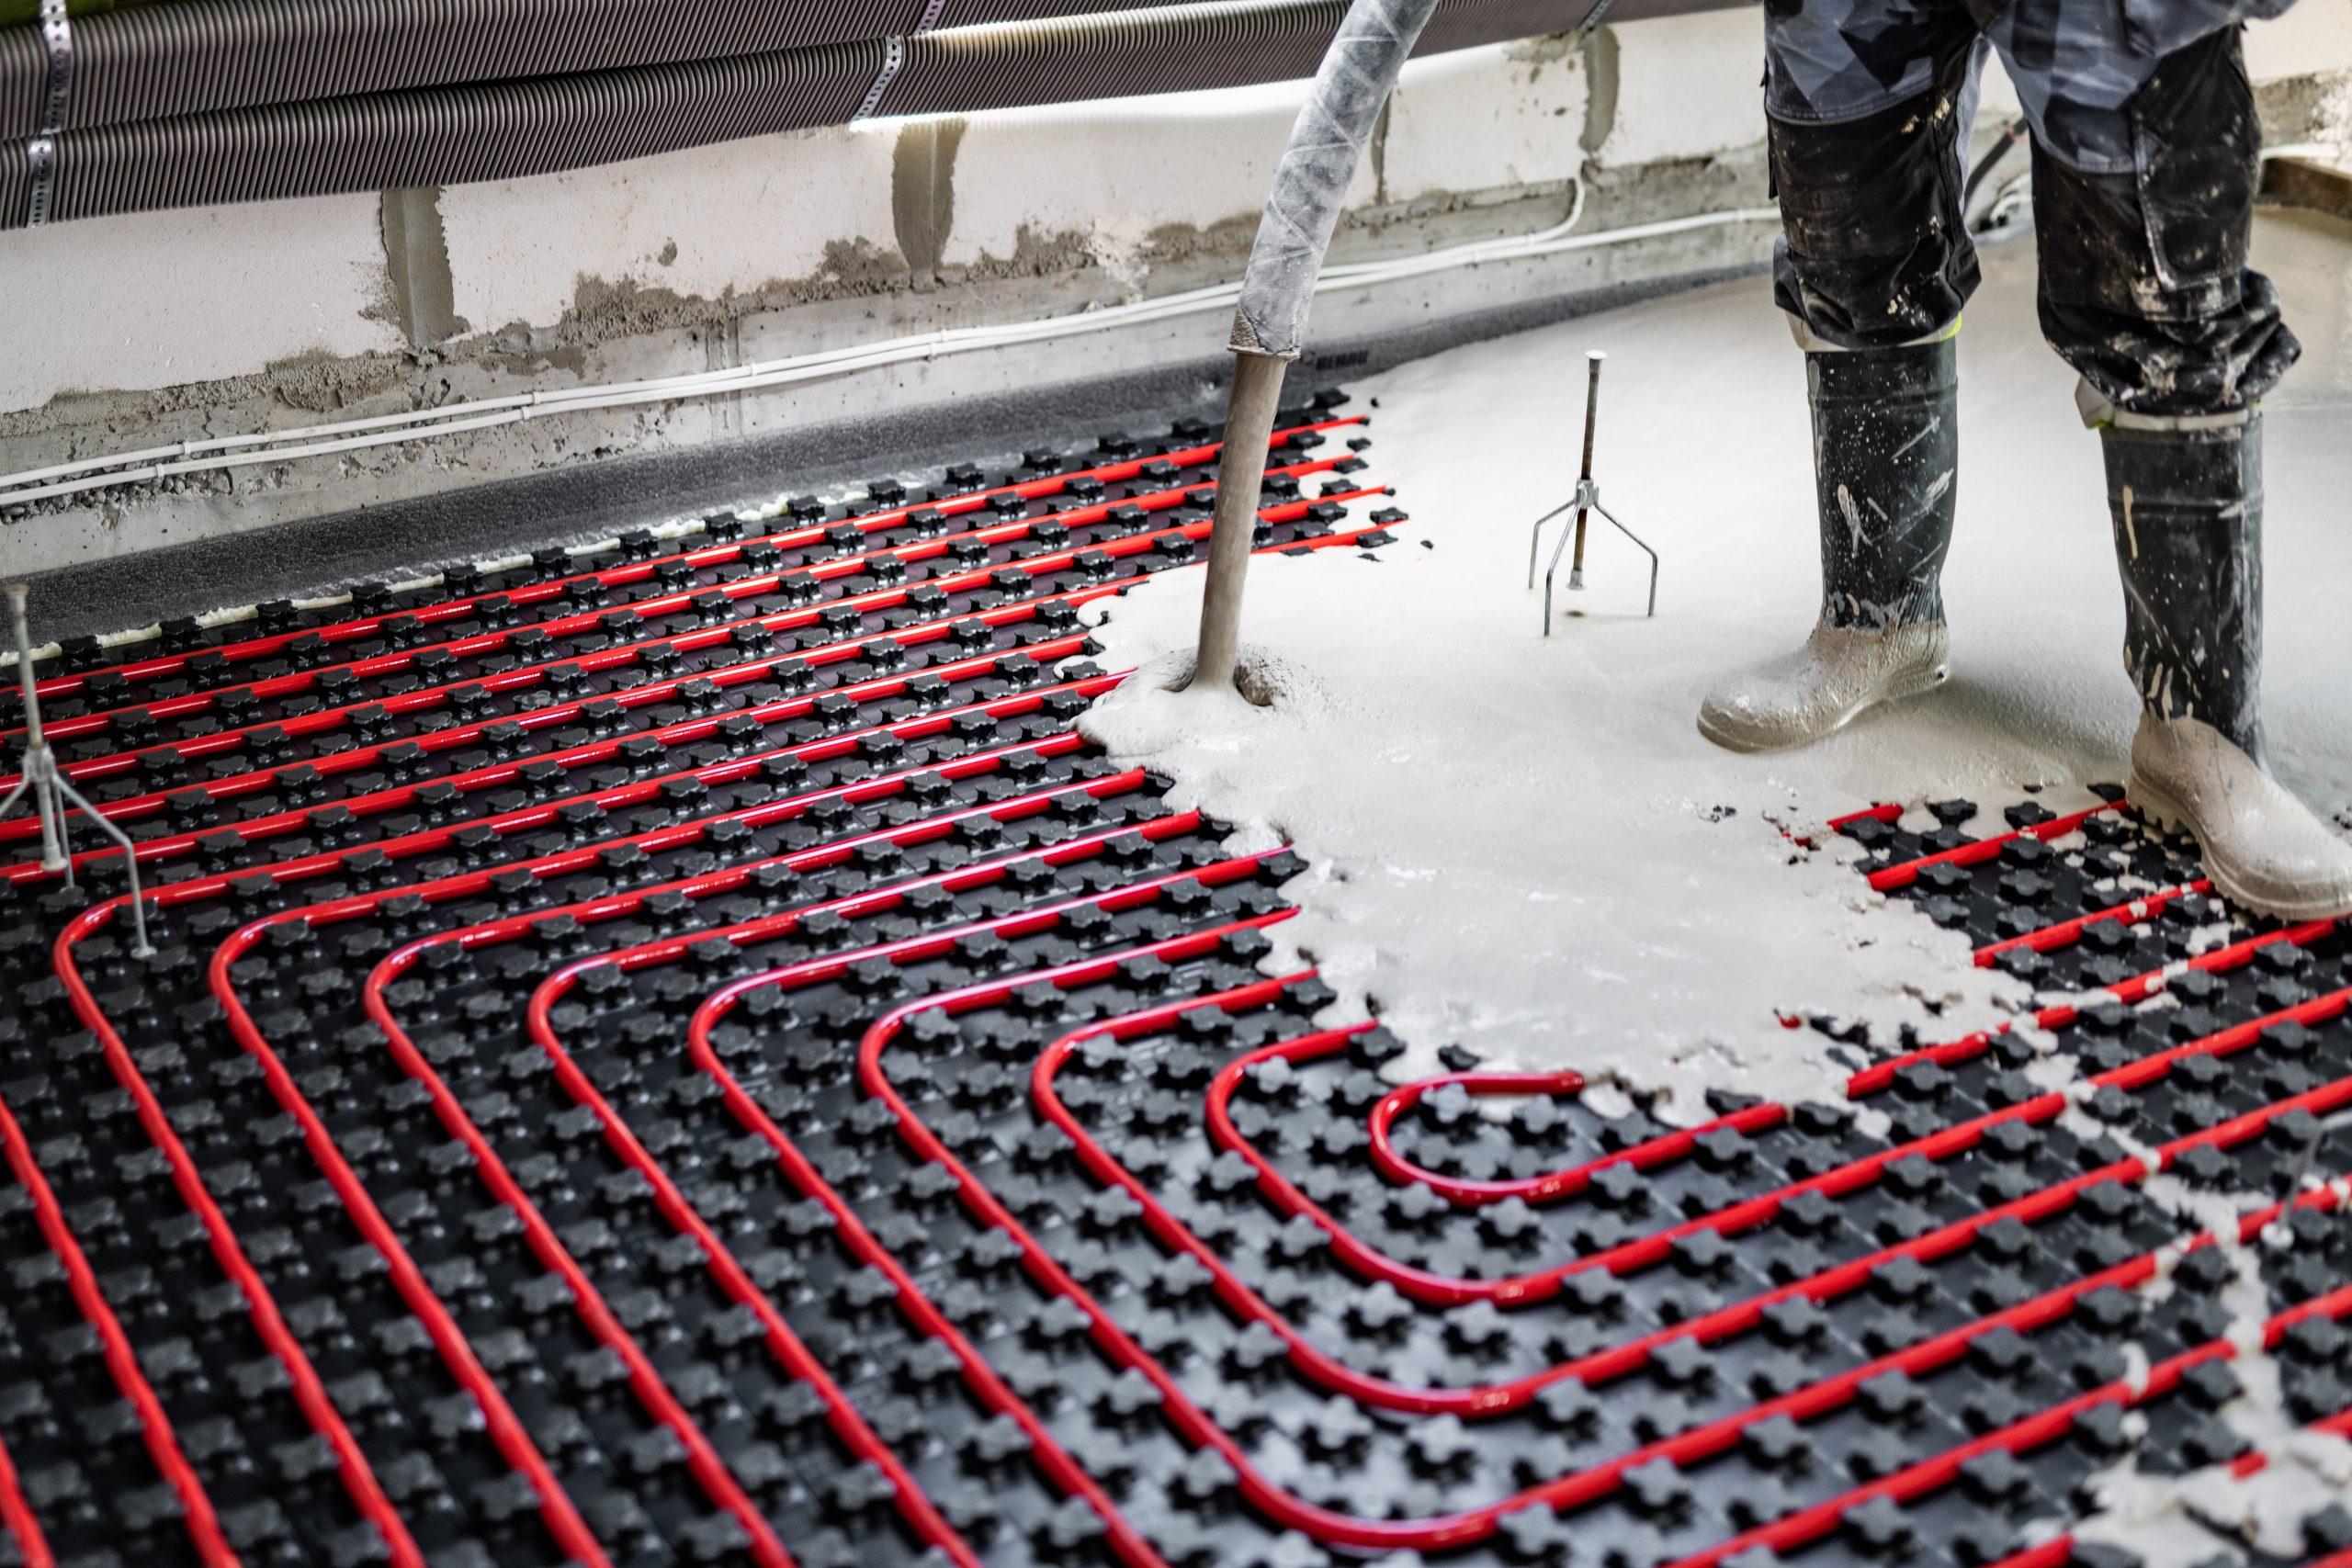 bertico Chape liquide sur plancher chauffant